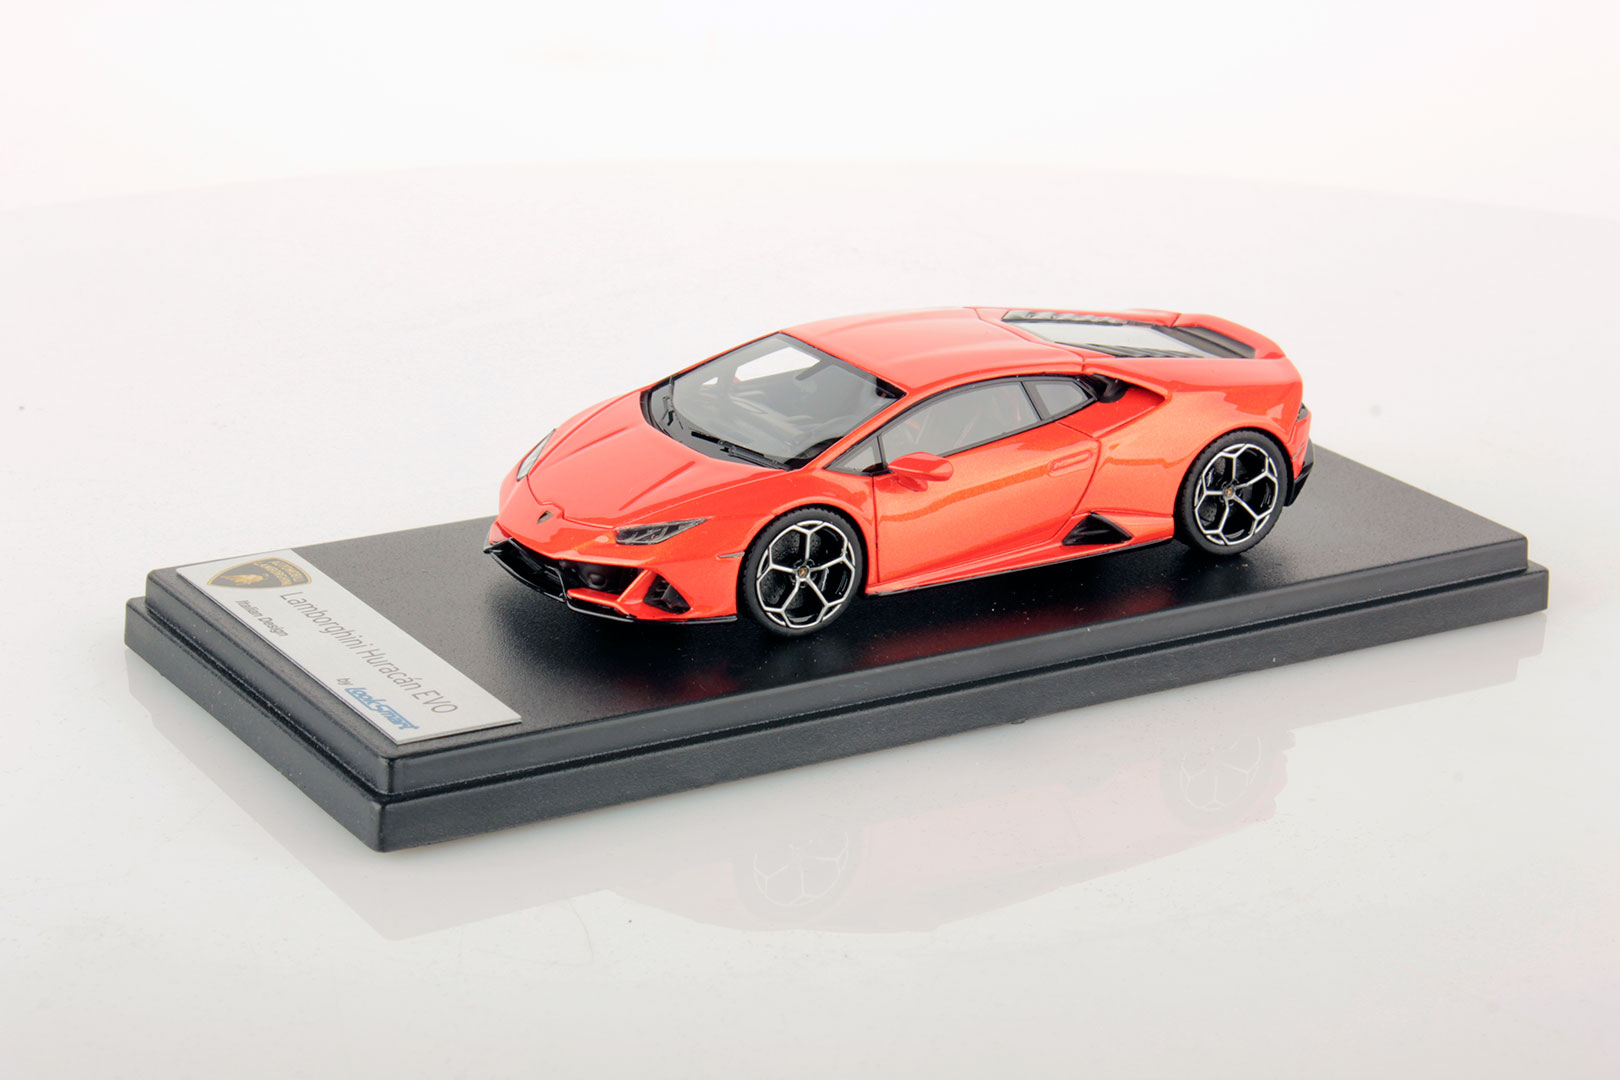 Lamborghini Huracan Evo miniature (3)